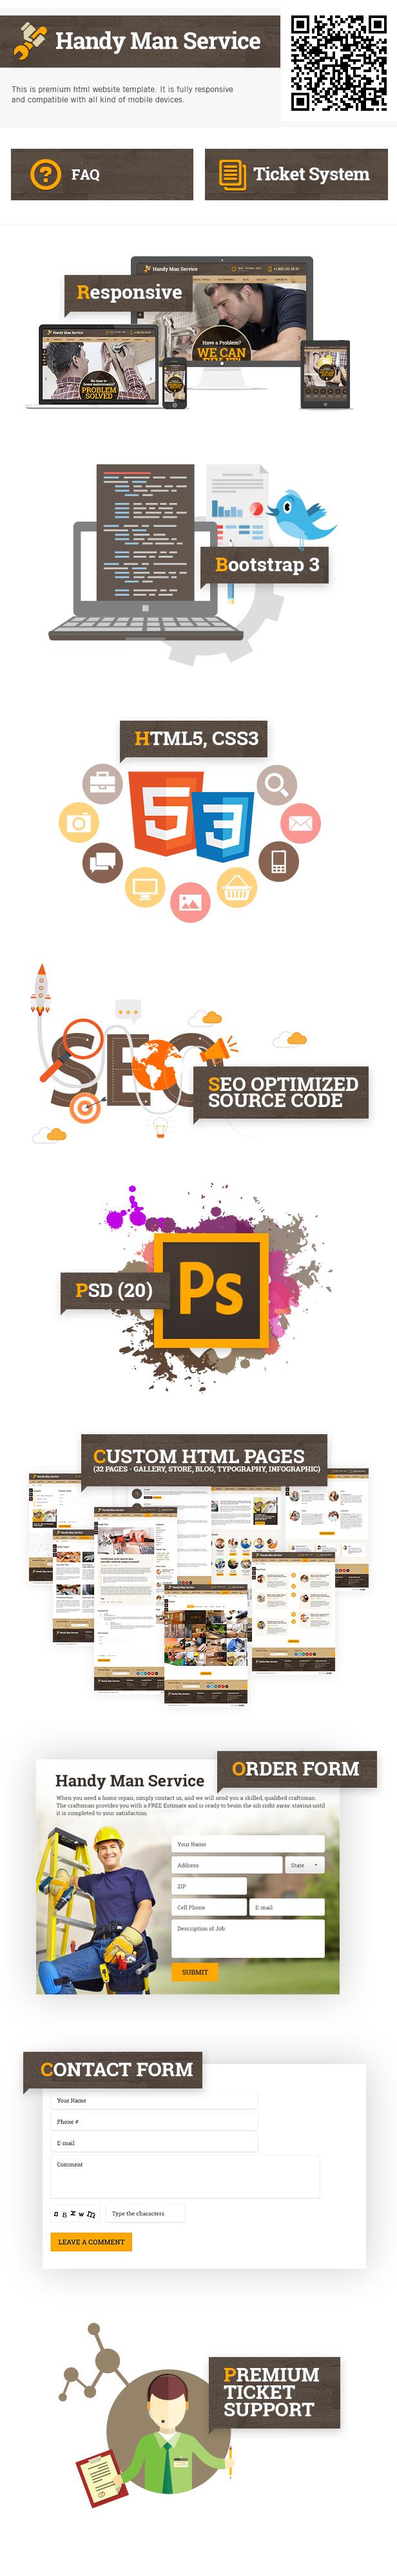 Presentation for Handy Man Service html5 website template